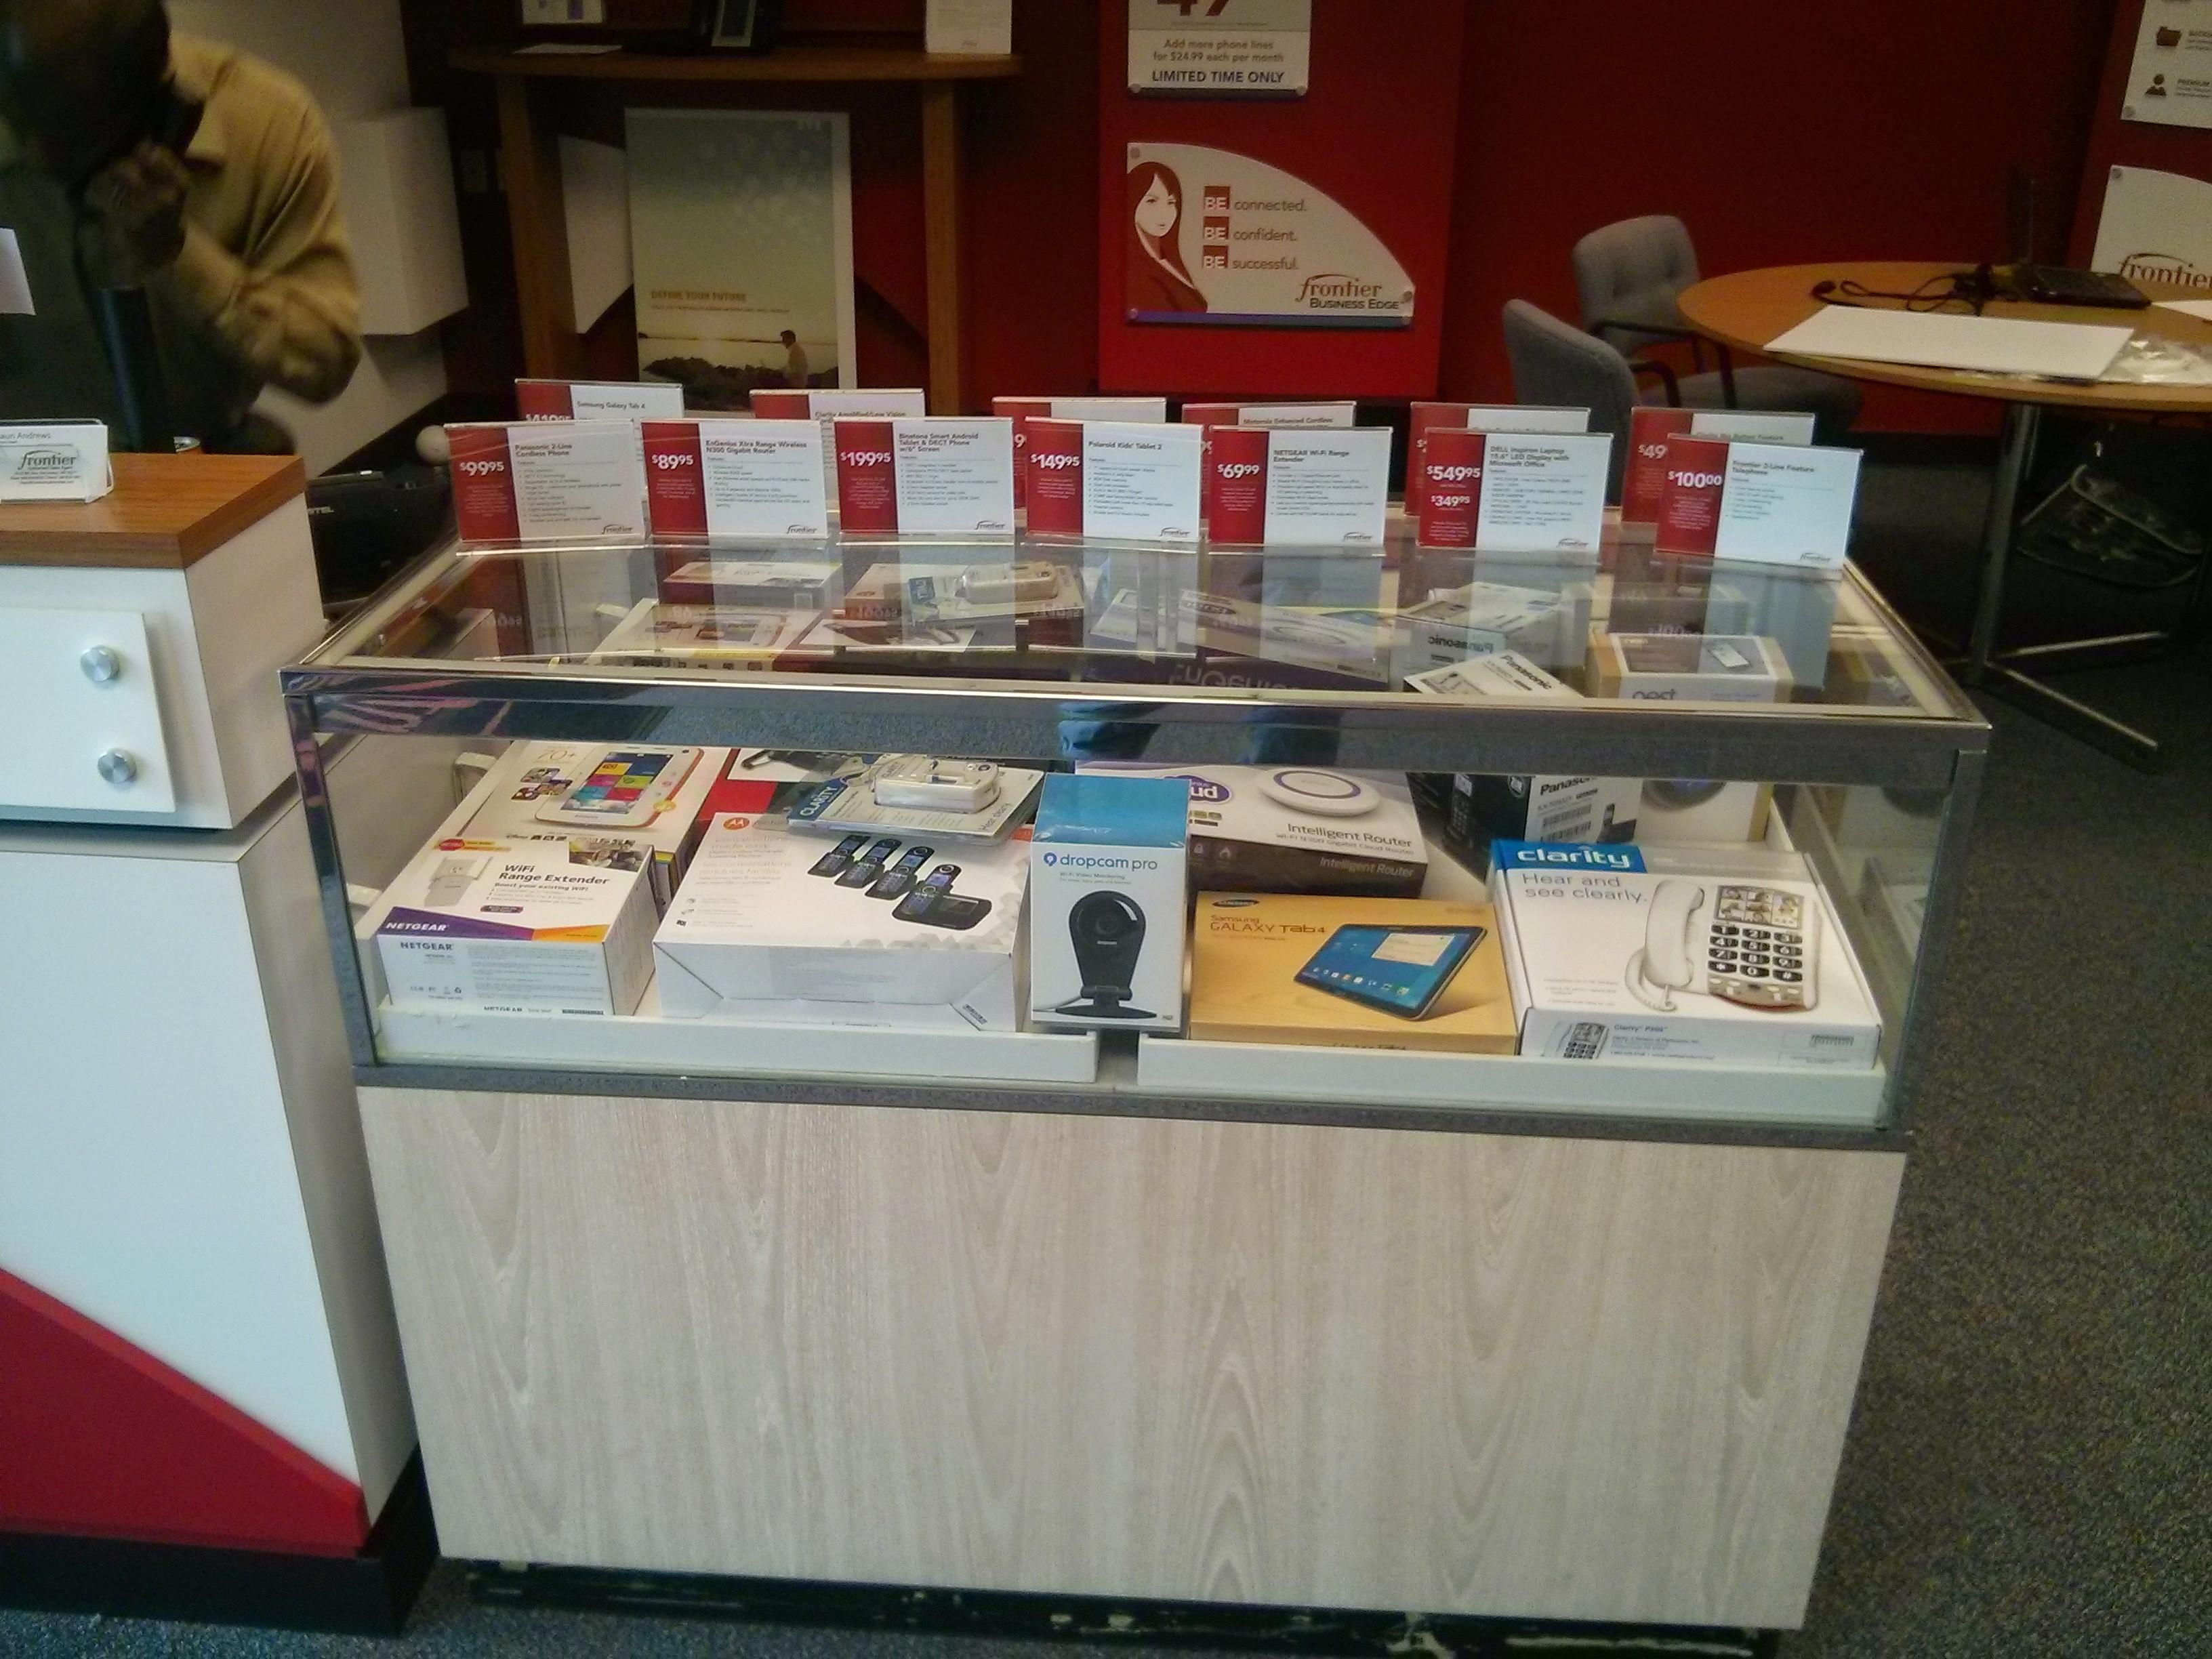 Frontier Communications Premier Store | 60 SE 8th Ave, Oak Harbor, WA, 98277 | +1 (360) 757-3256